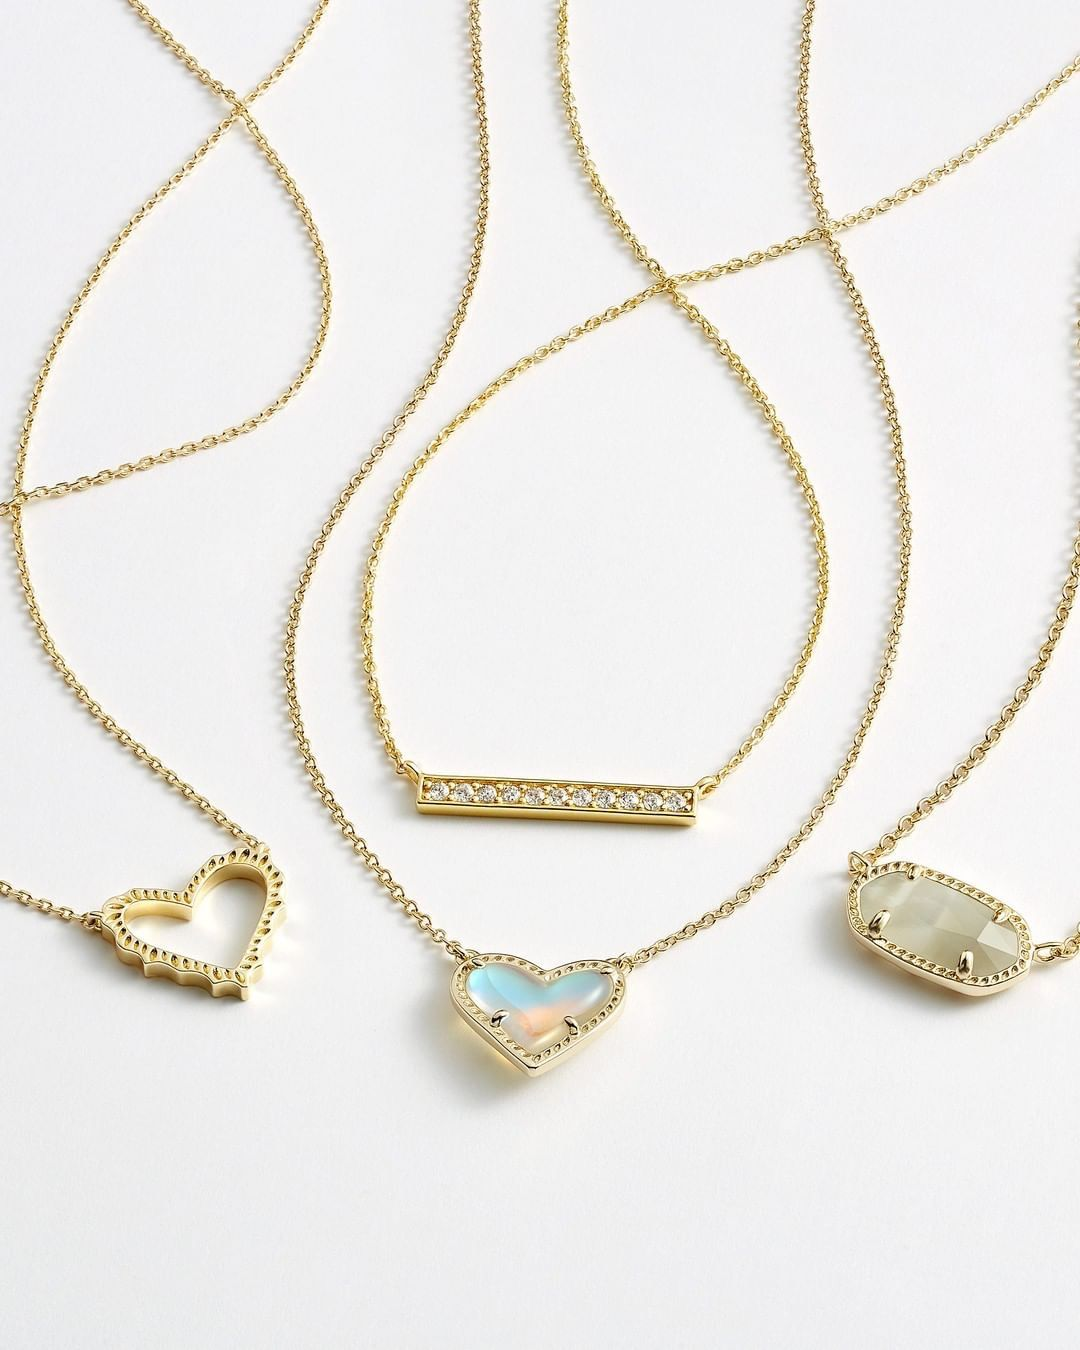 39+ Where can i find kendra scott jewelry info